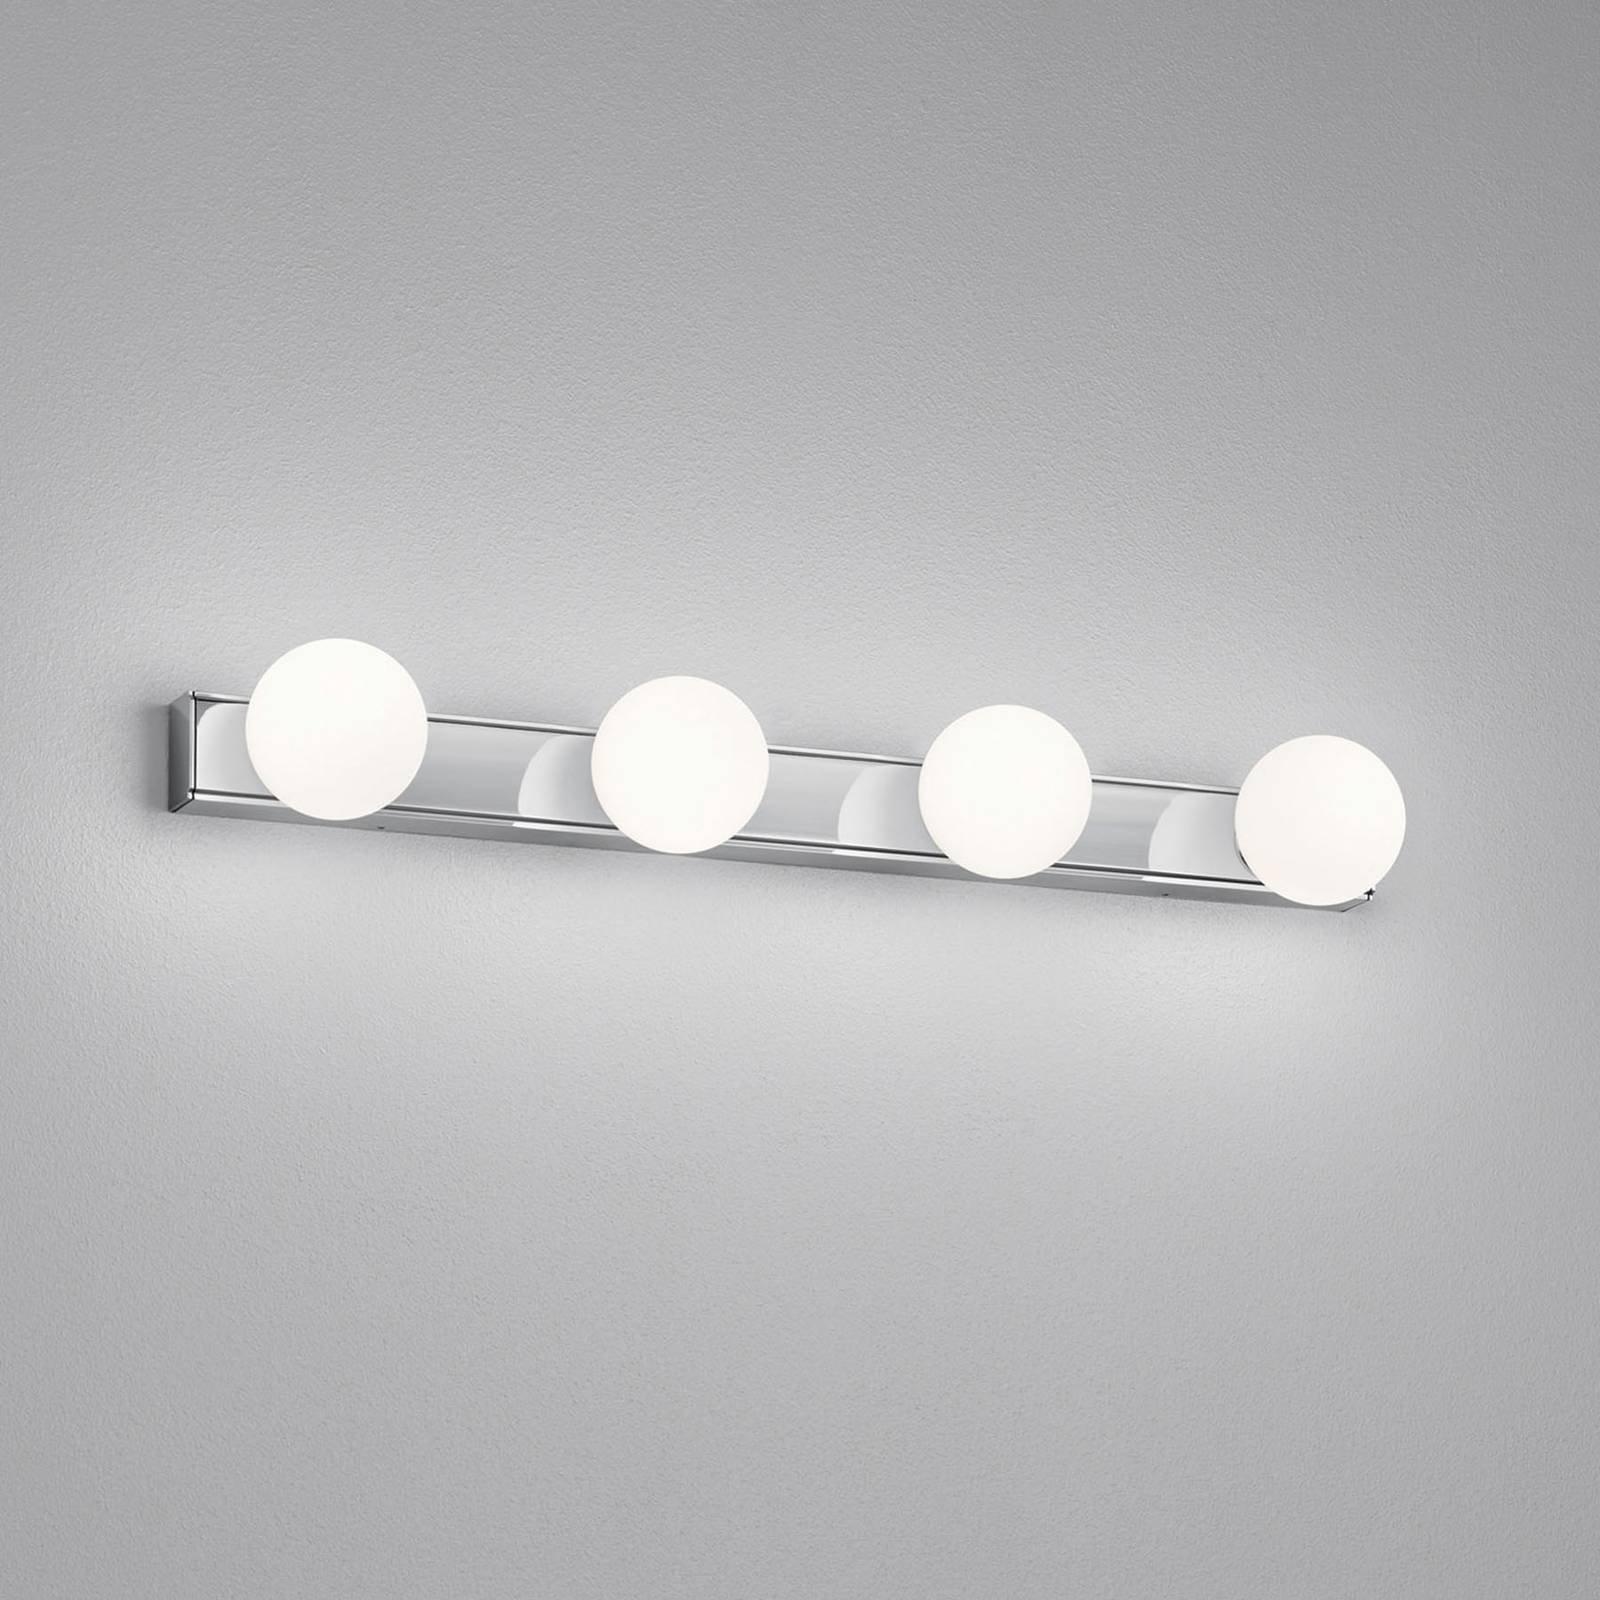 Helestra Lis LED-speillampe, 4 lyskilder